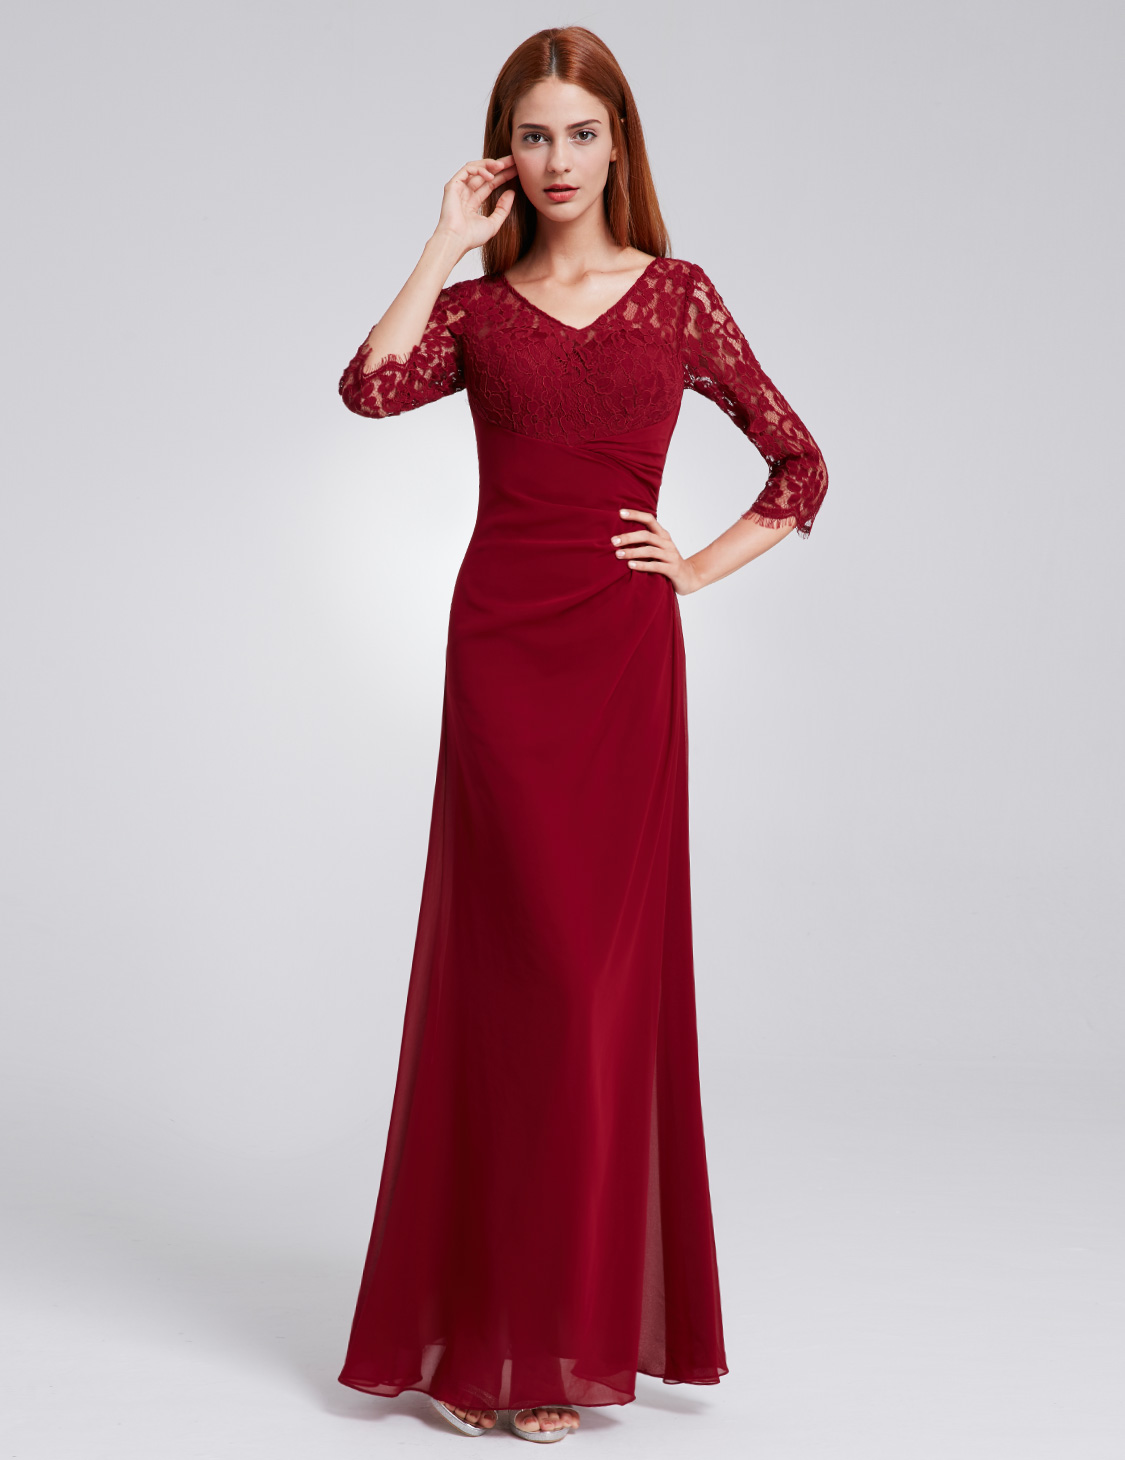 EverPretty Women Formal Long Dresses Lace 3/4 Sleeves V ...